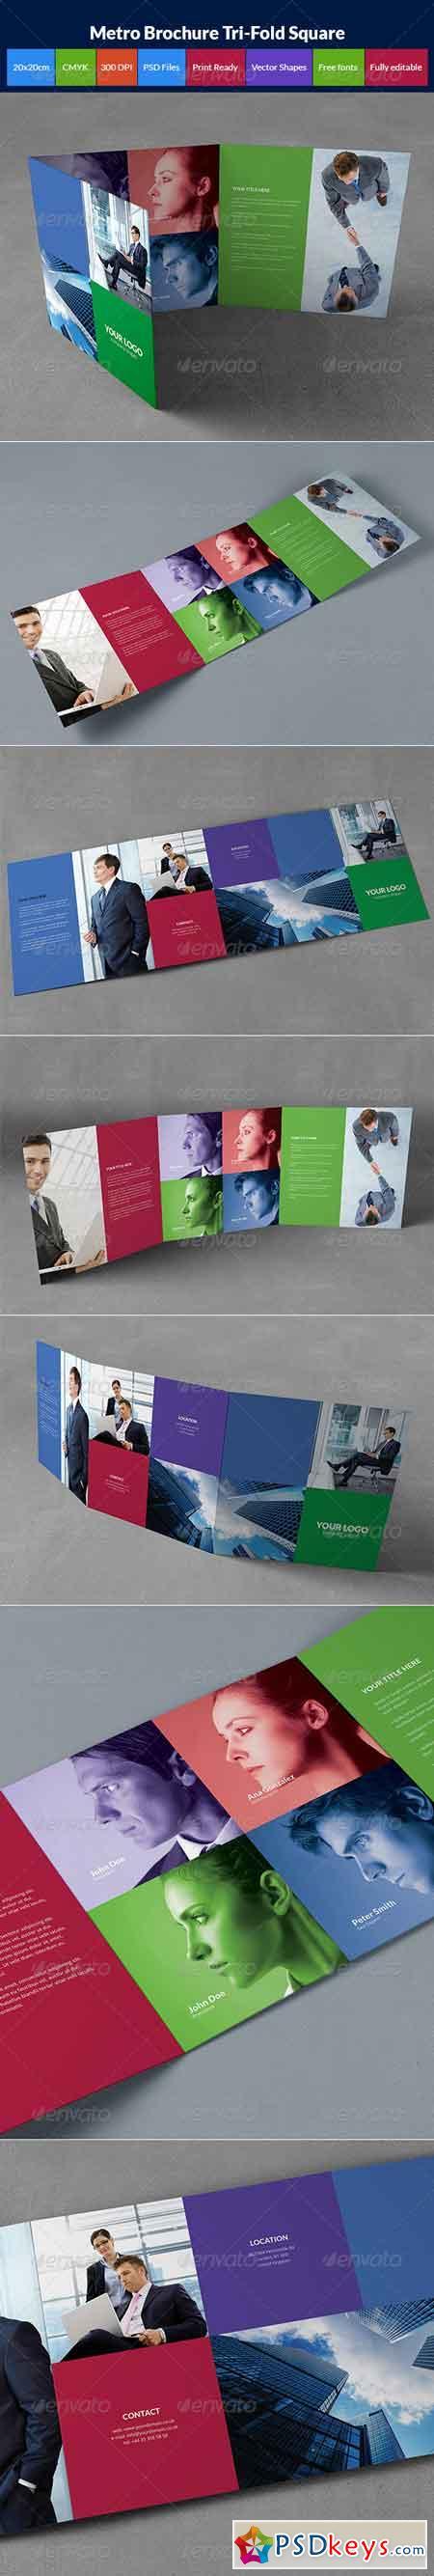 Metro brochure tri-fold square 8563474